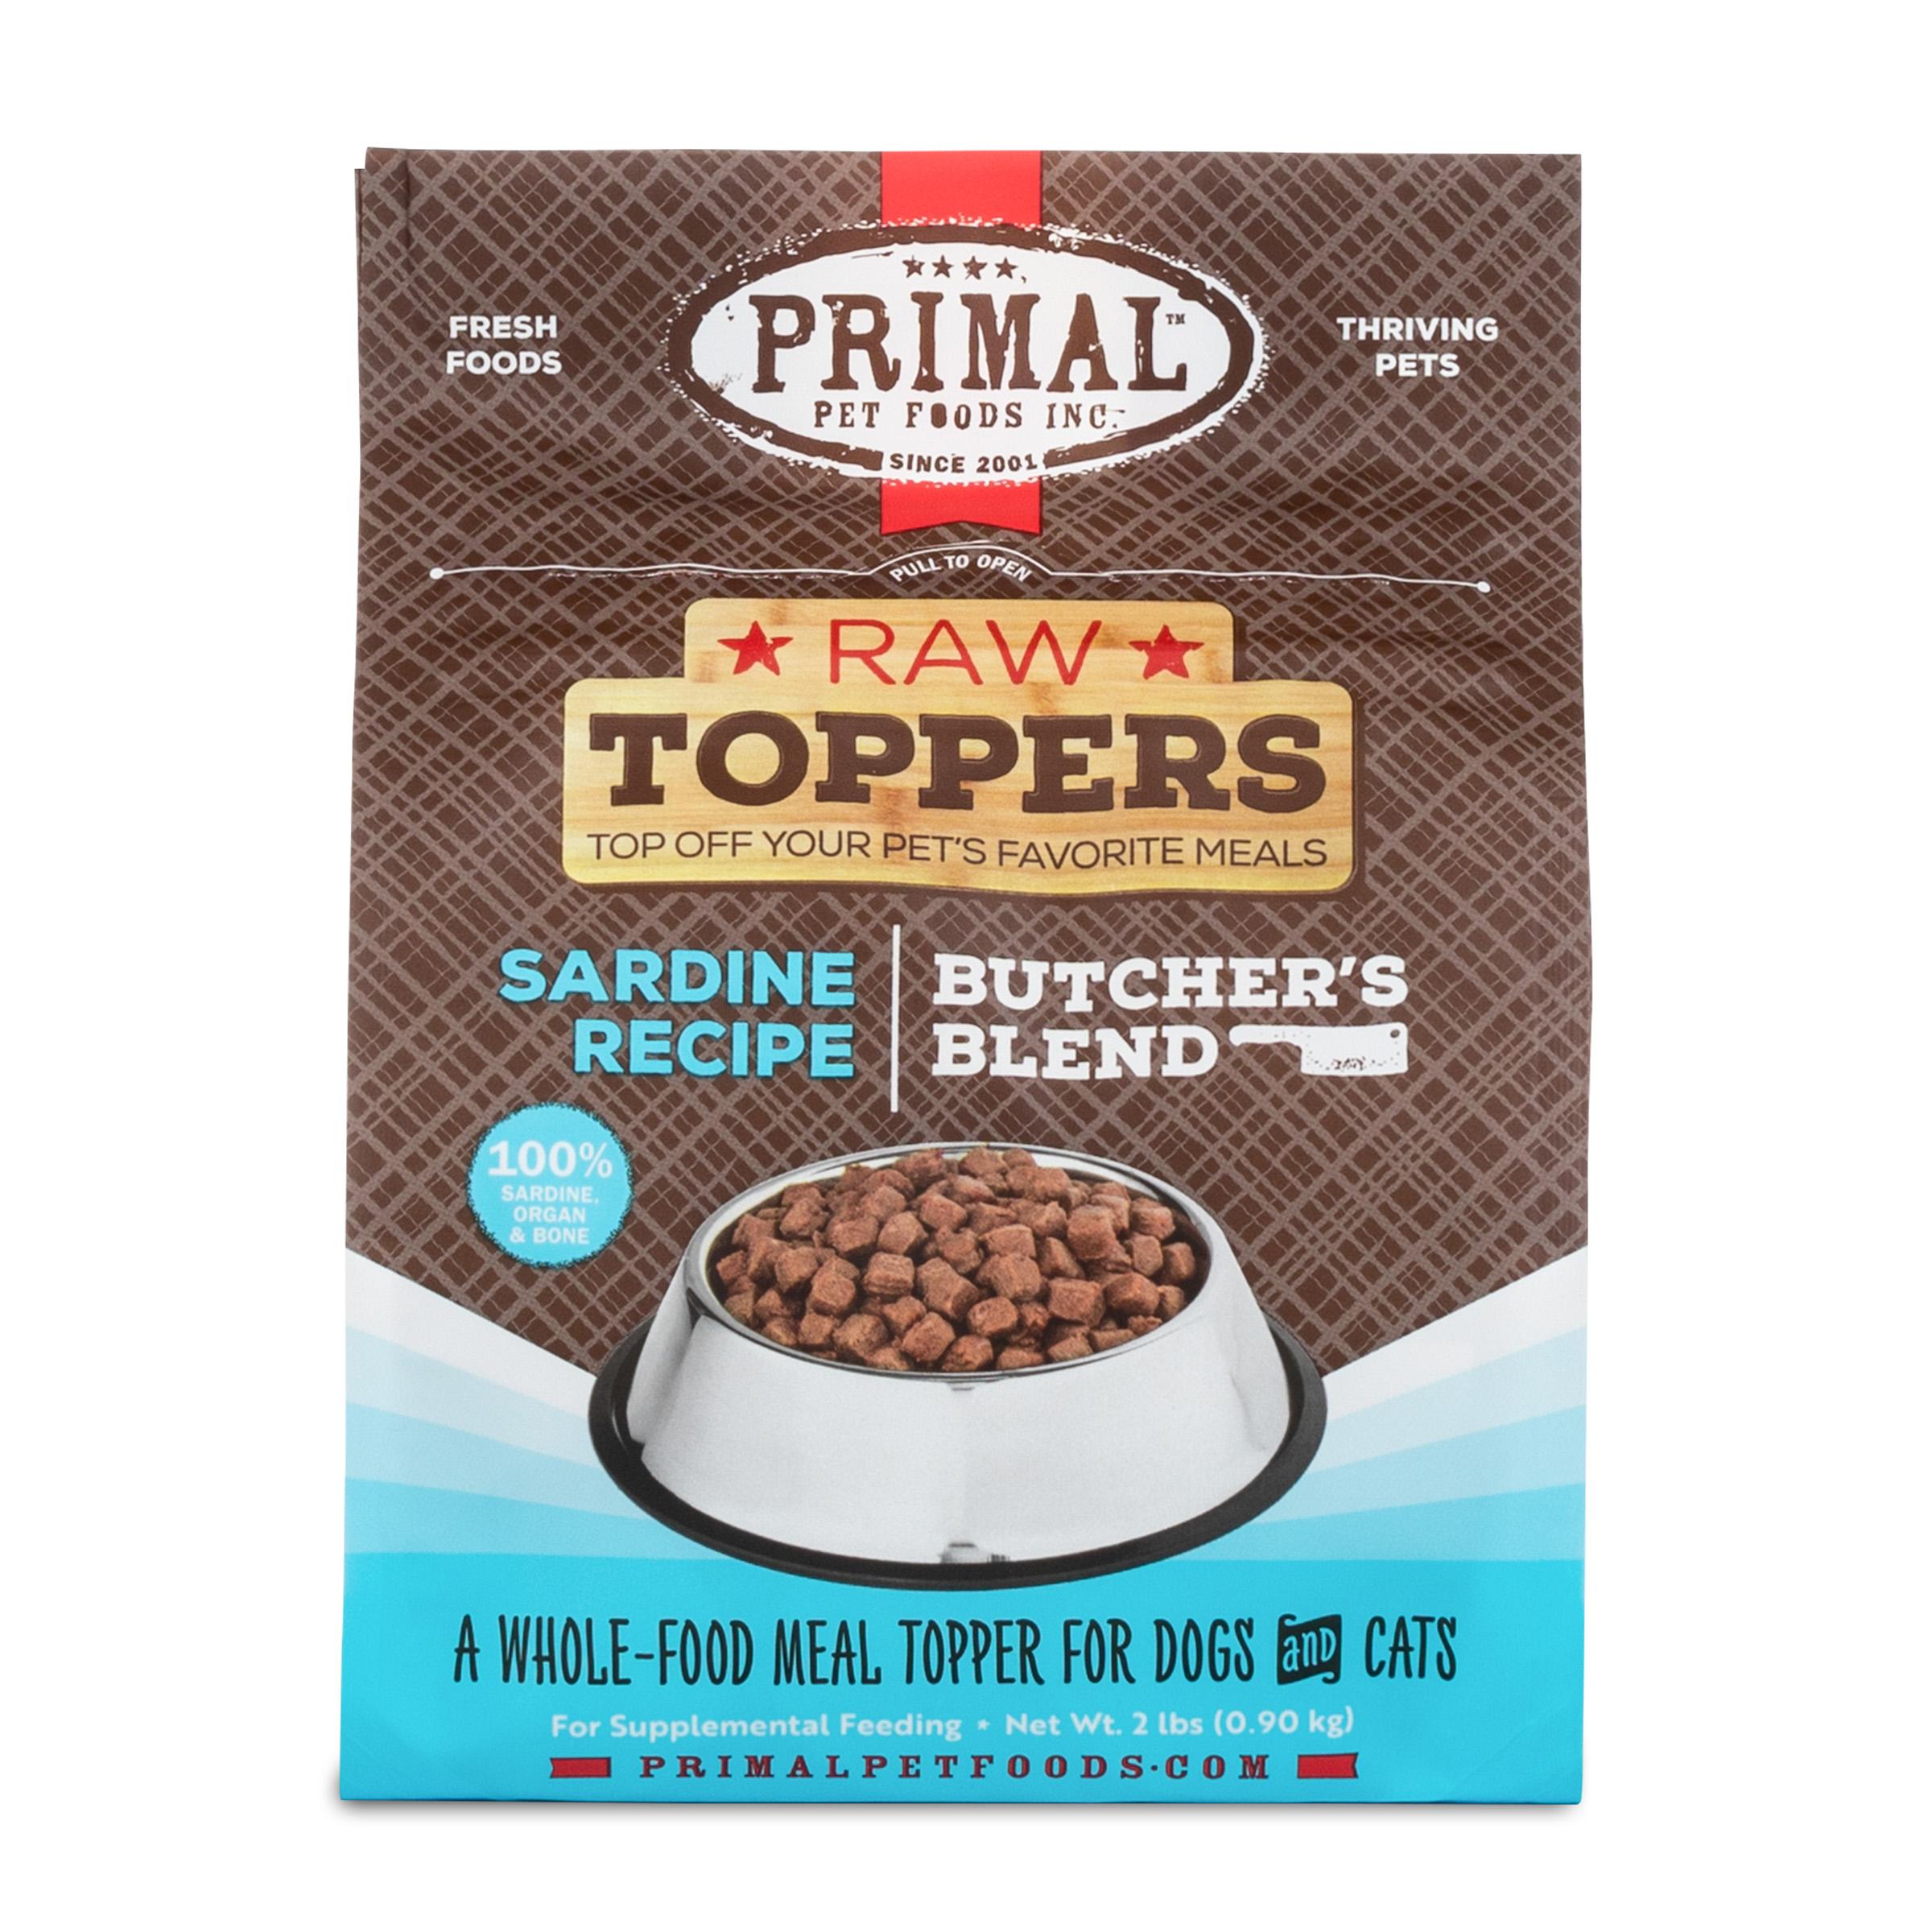 Primal Raw Toppers Butcher's Blend Sardine Dog & Cat Food Topper, 2-lb